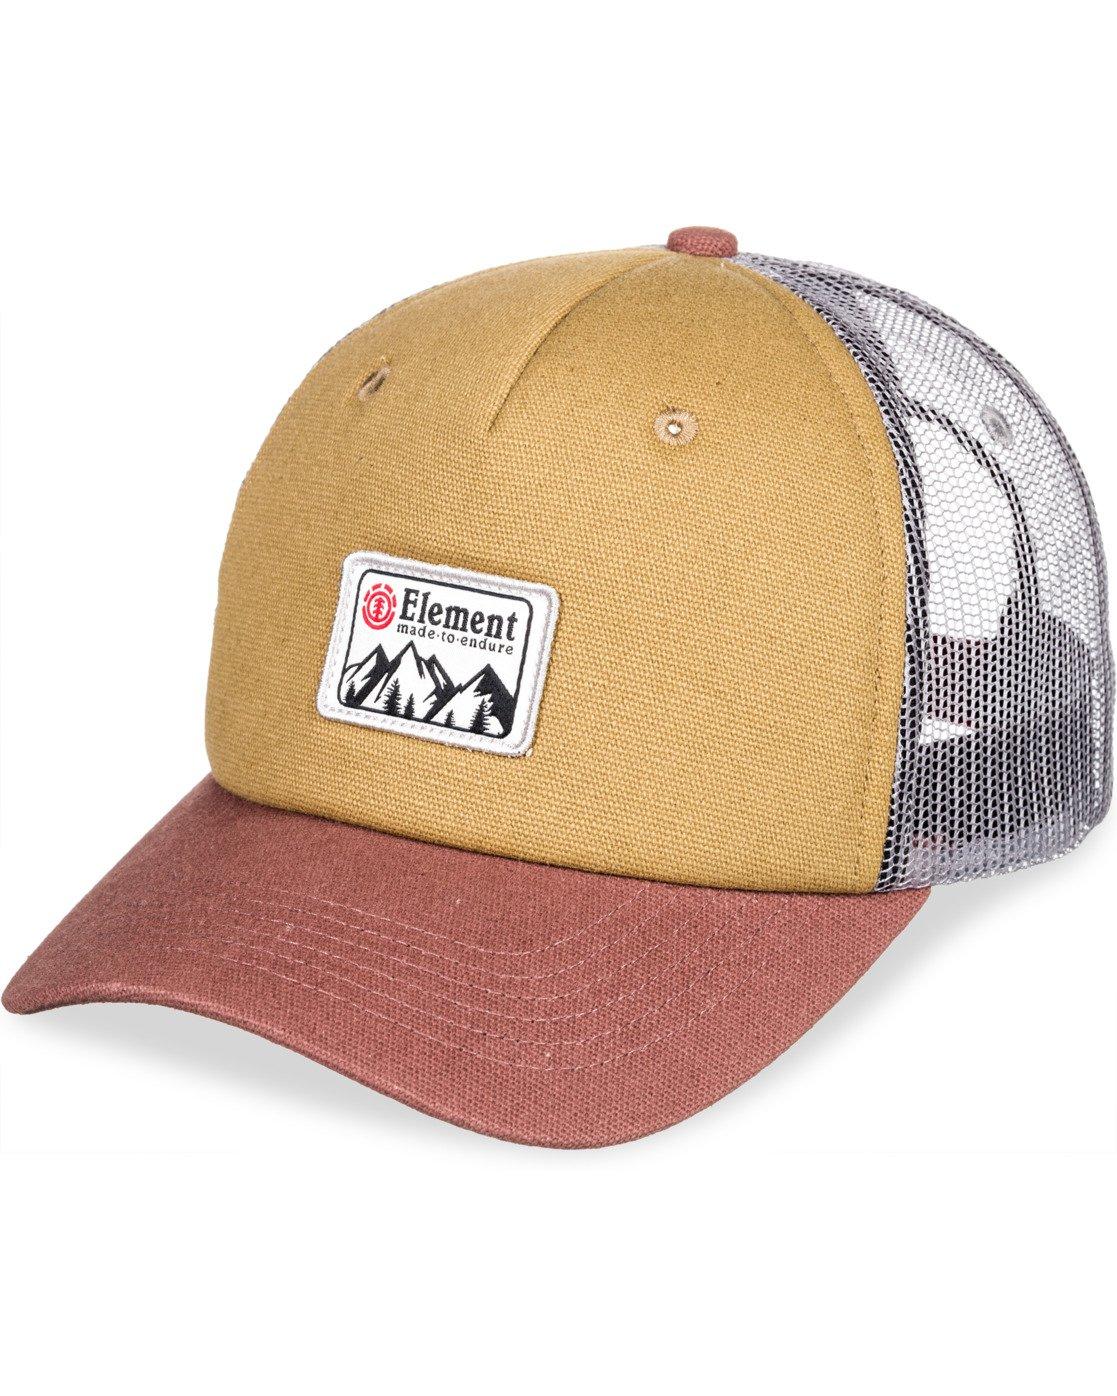 3 Icon Trucker Hat Brown MAHT3EIC Element